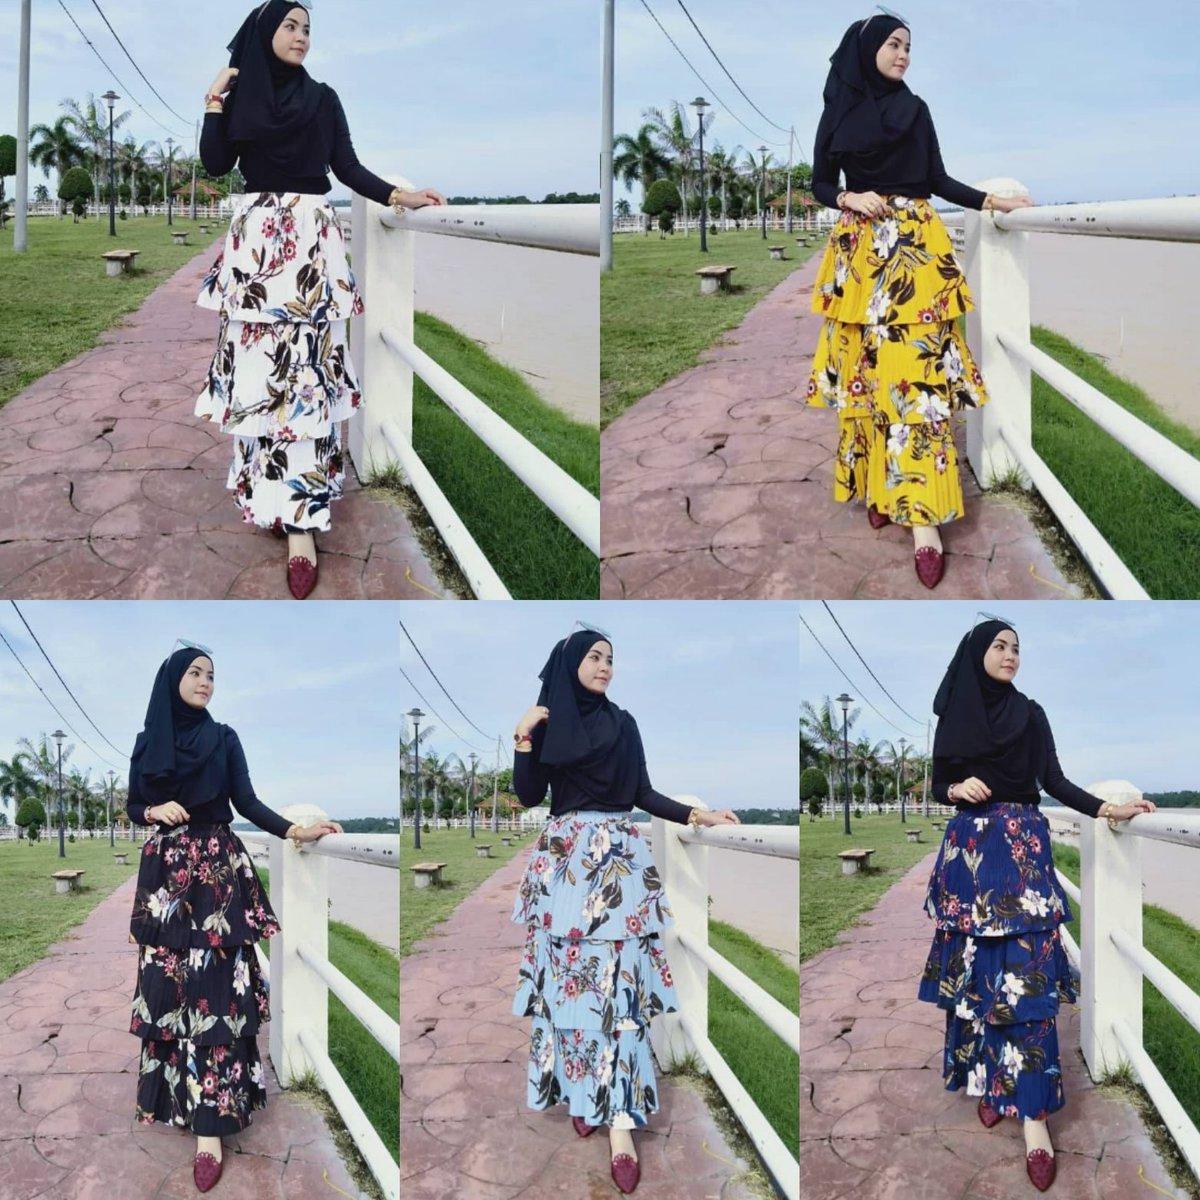 Haii saya ada jual SKIRT PLEATED PRINTED 3 LAYER   RM38 SM / RM42 SS   MATERIAL : CREPE FREE SIZE : FIT S TIL 2XL  http://wasap.my/601116882377/NakSkirtPleated…  #readystock #readyitemdbf #skirt #skirtpleated #pleatedskirt #fashionskirt #casualskirt #skirtlabuh #longskirt #BC #dropshipbyfaapic.twitter.com/bGn8SaIwIl